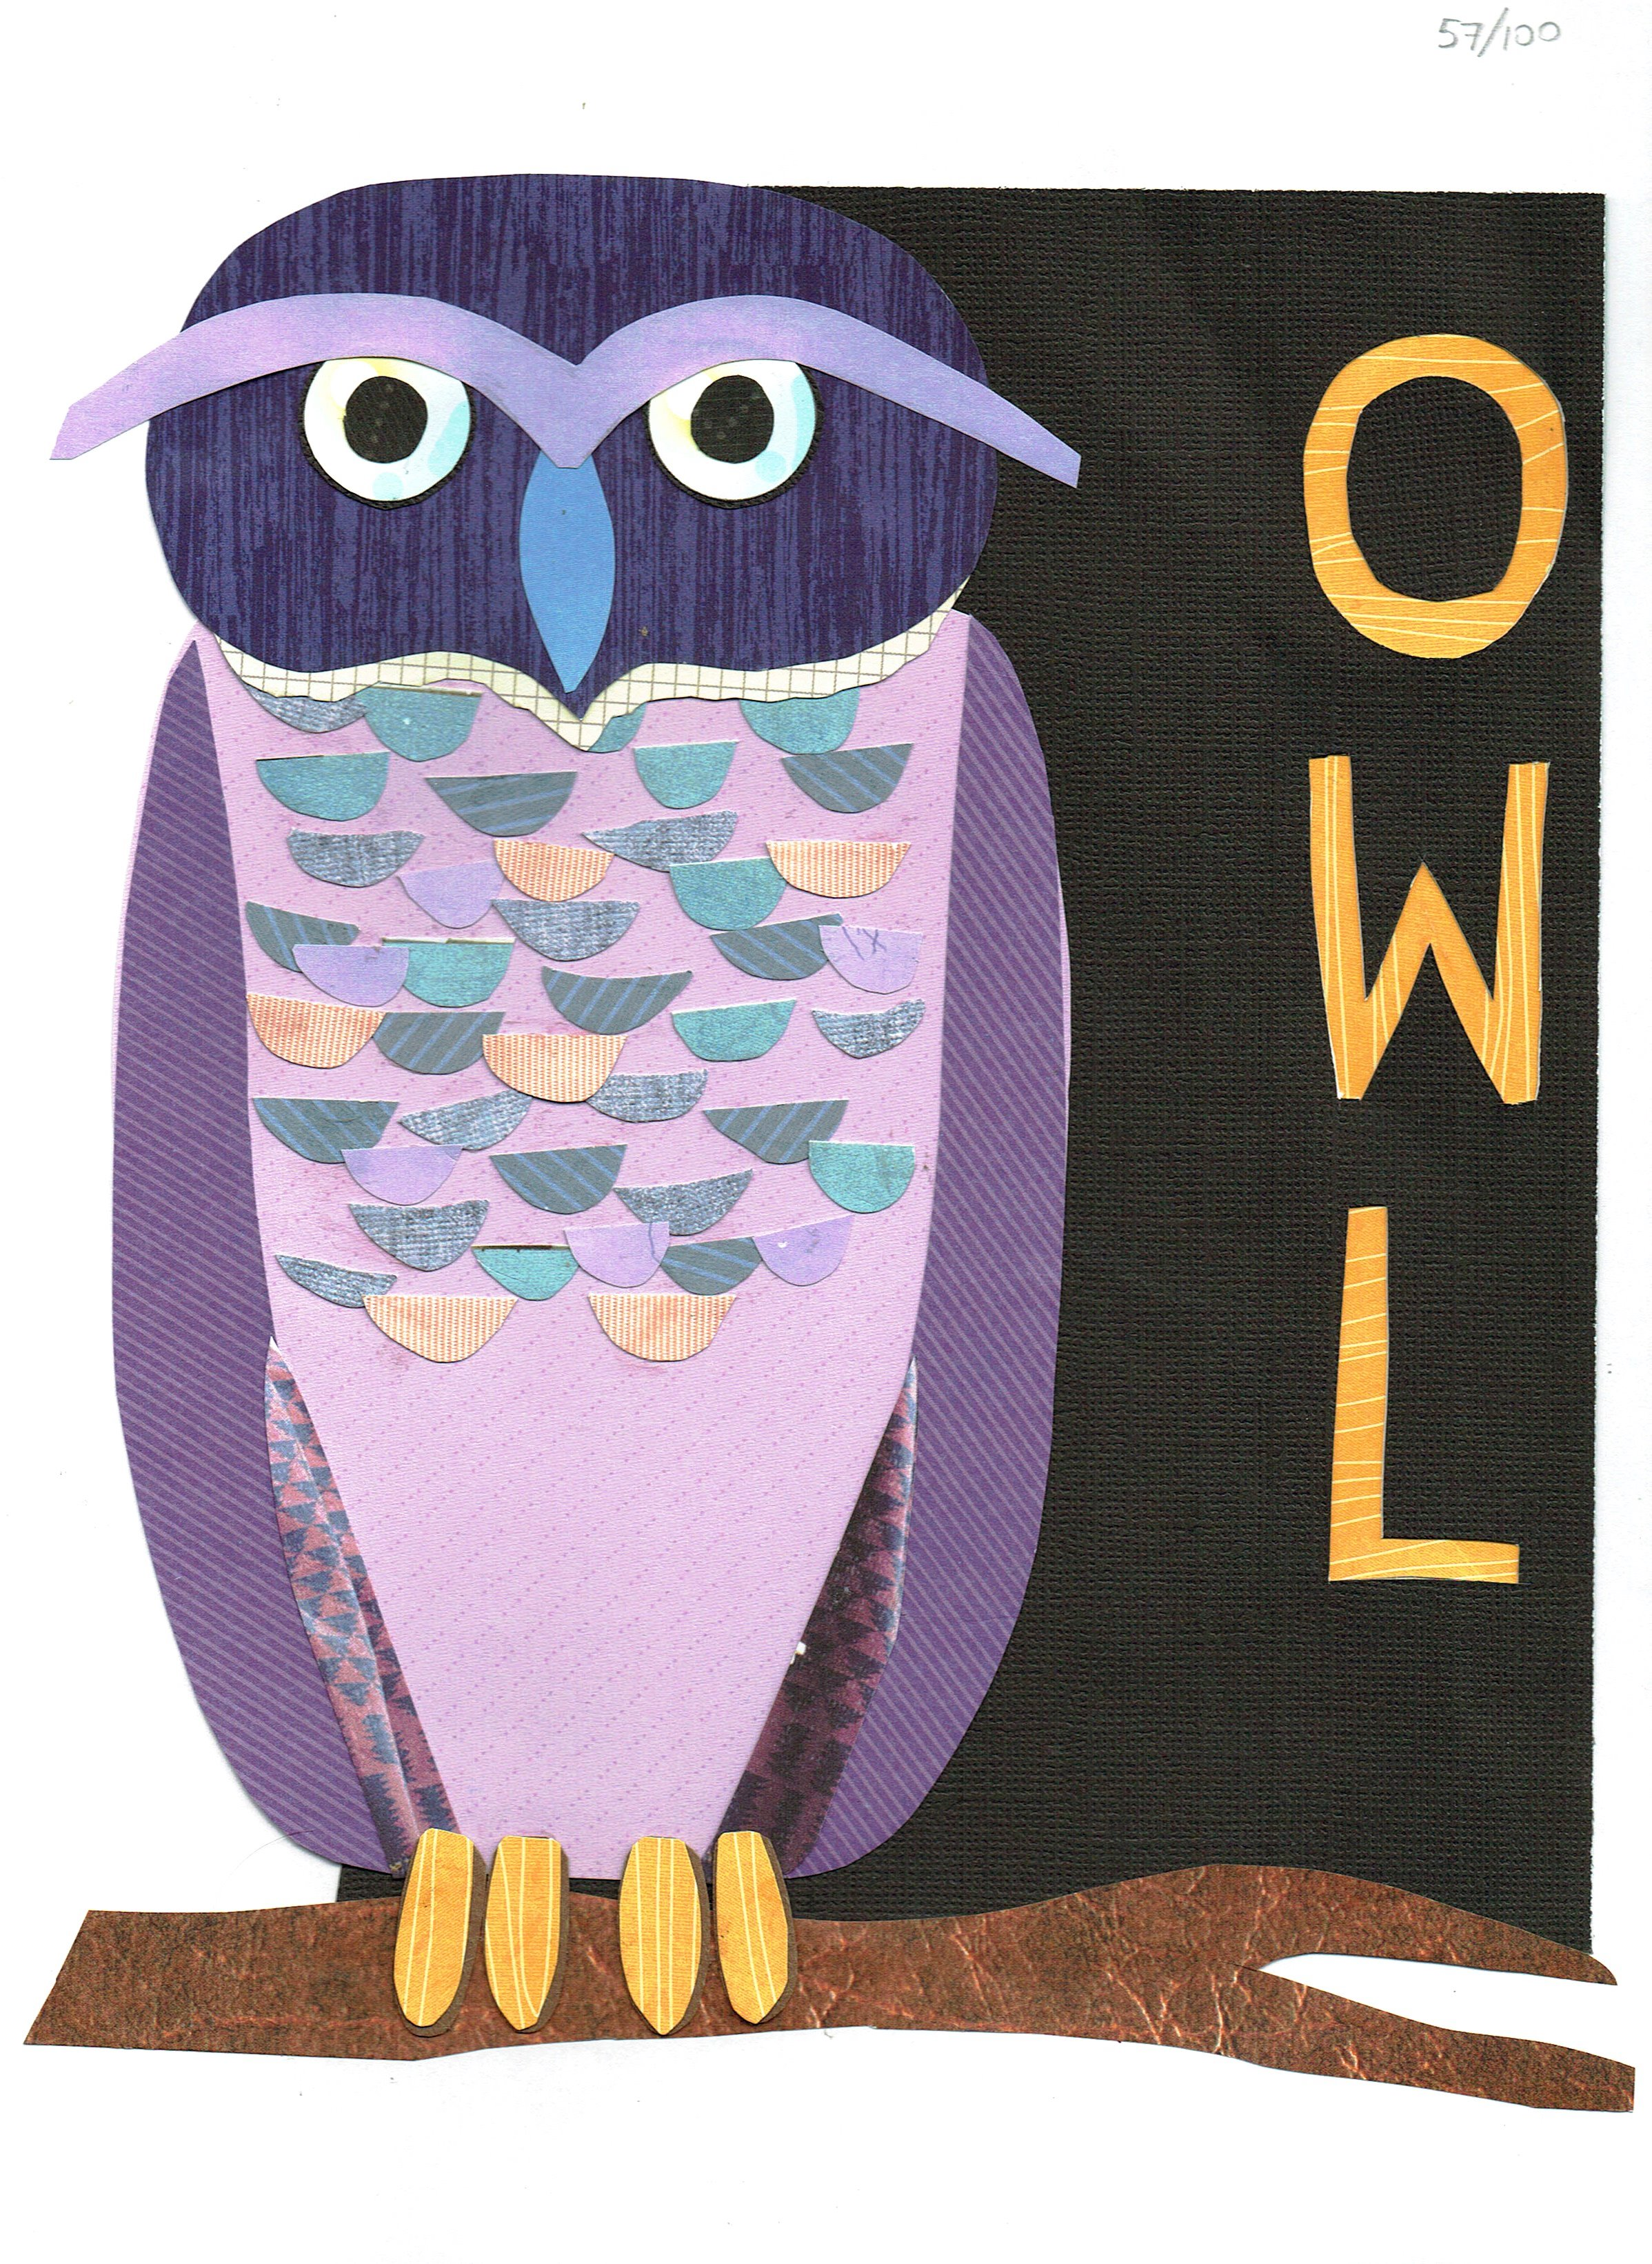 Day 57 - Owl